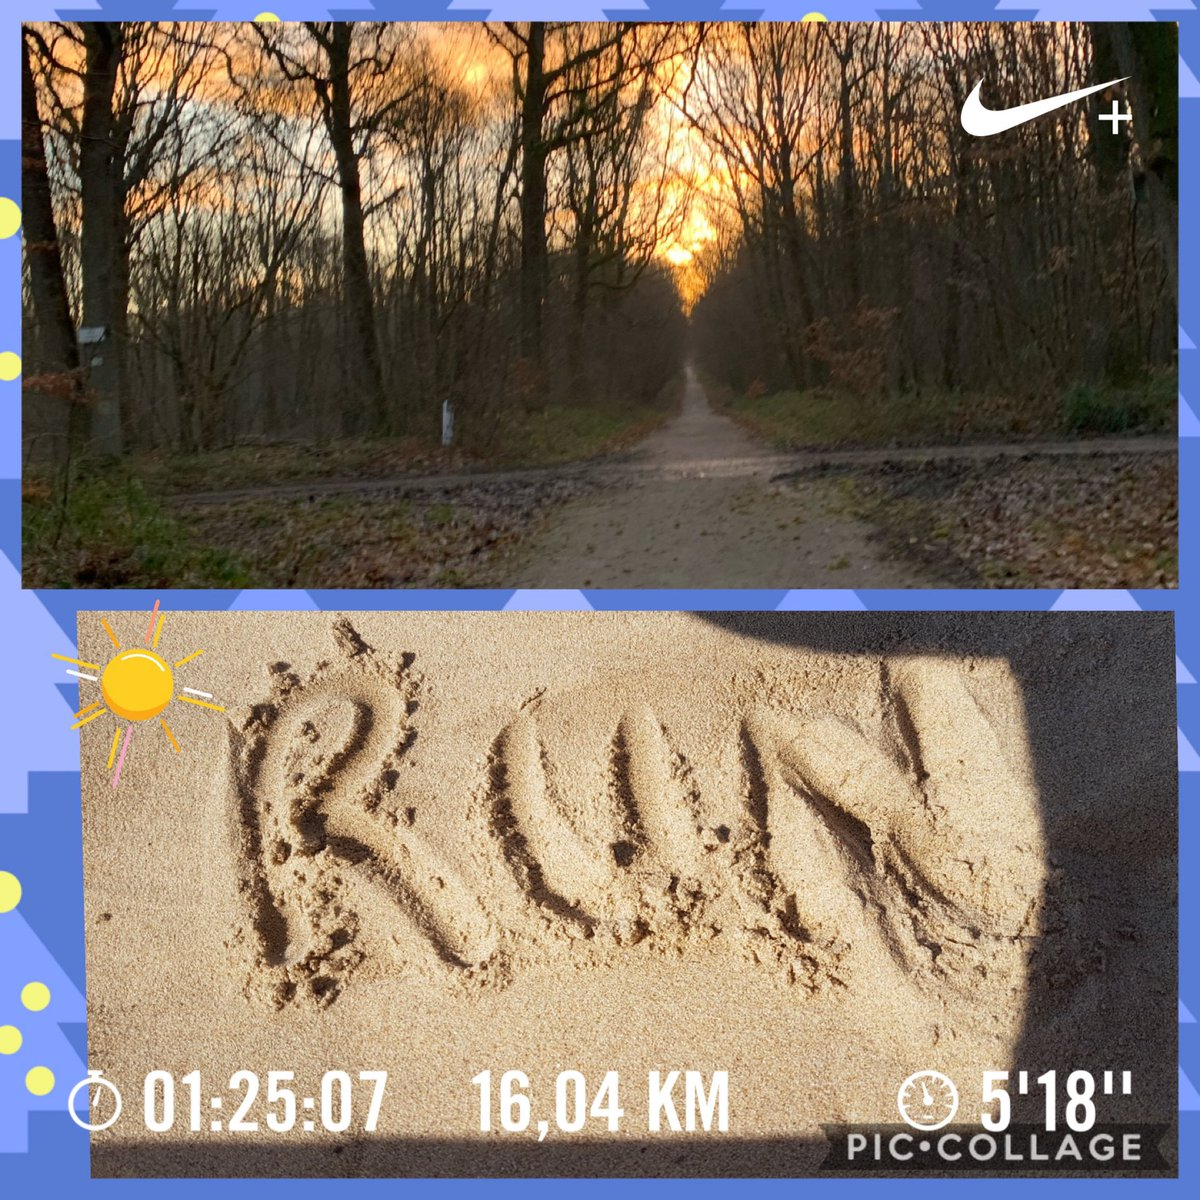 Run matinal  #sportmotivation #prepamarathon #onlacherien pic.twitter.com/ZJjX8GTtiD